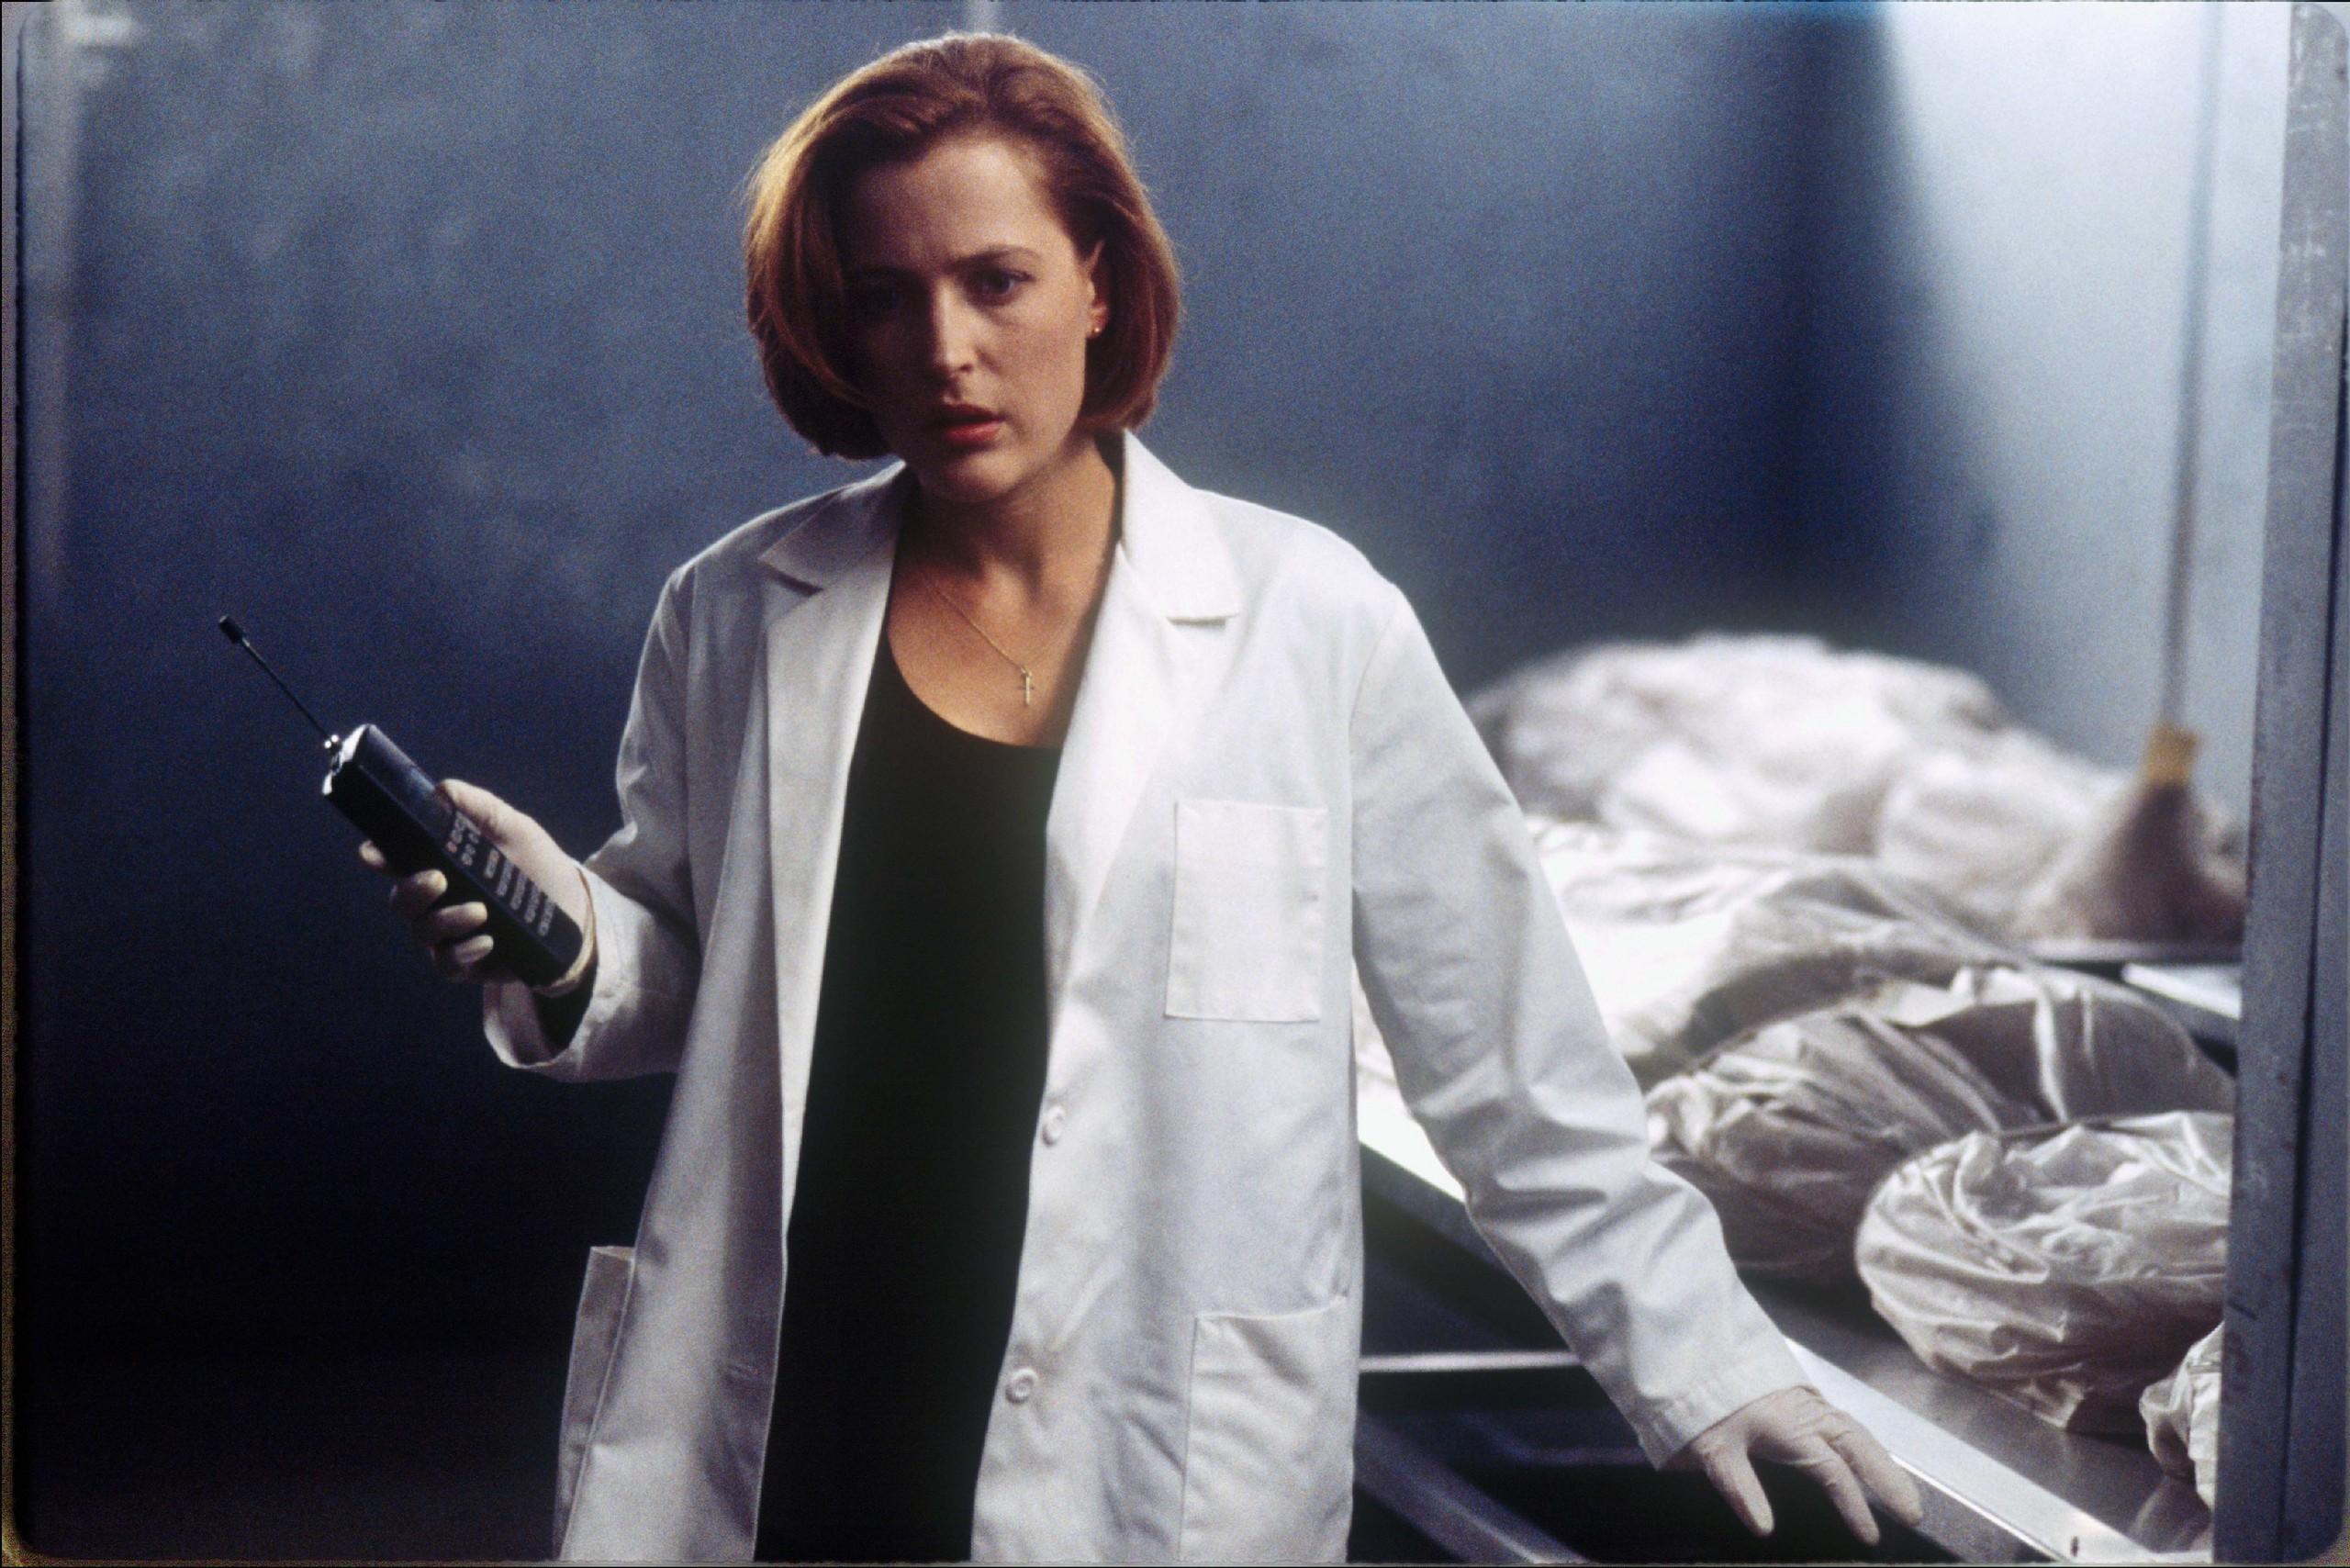 The X-Files Секретные материалы Скалли